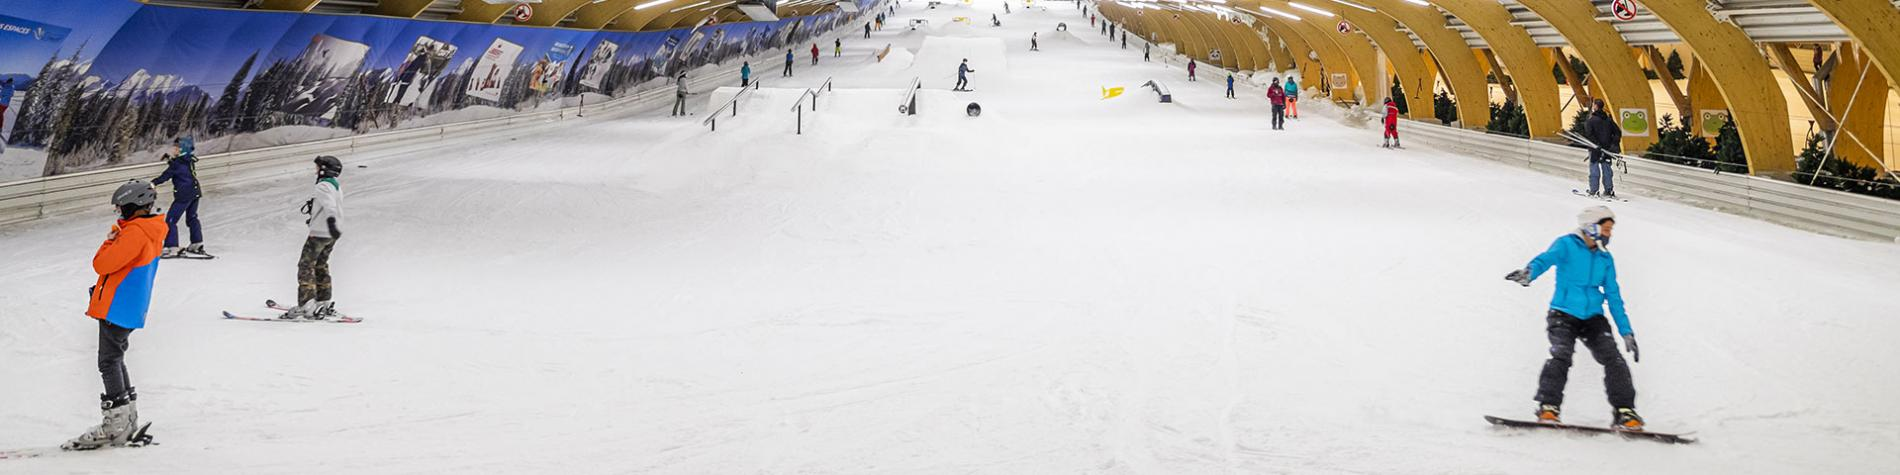 Ice Mountain Adventure Park Comines